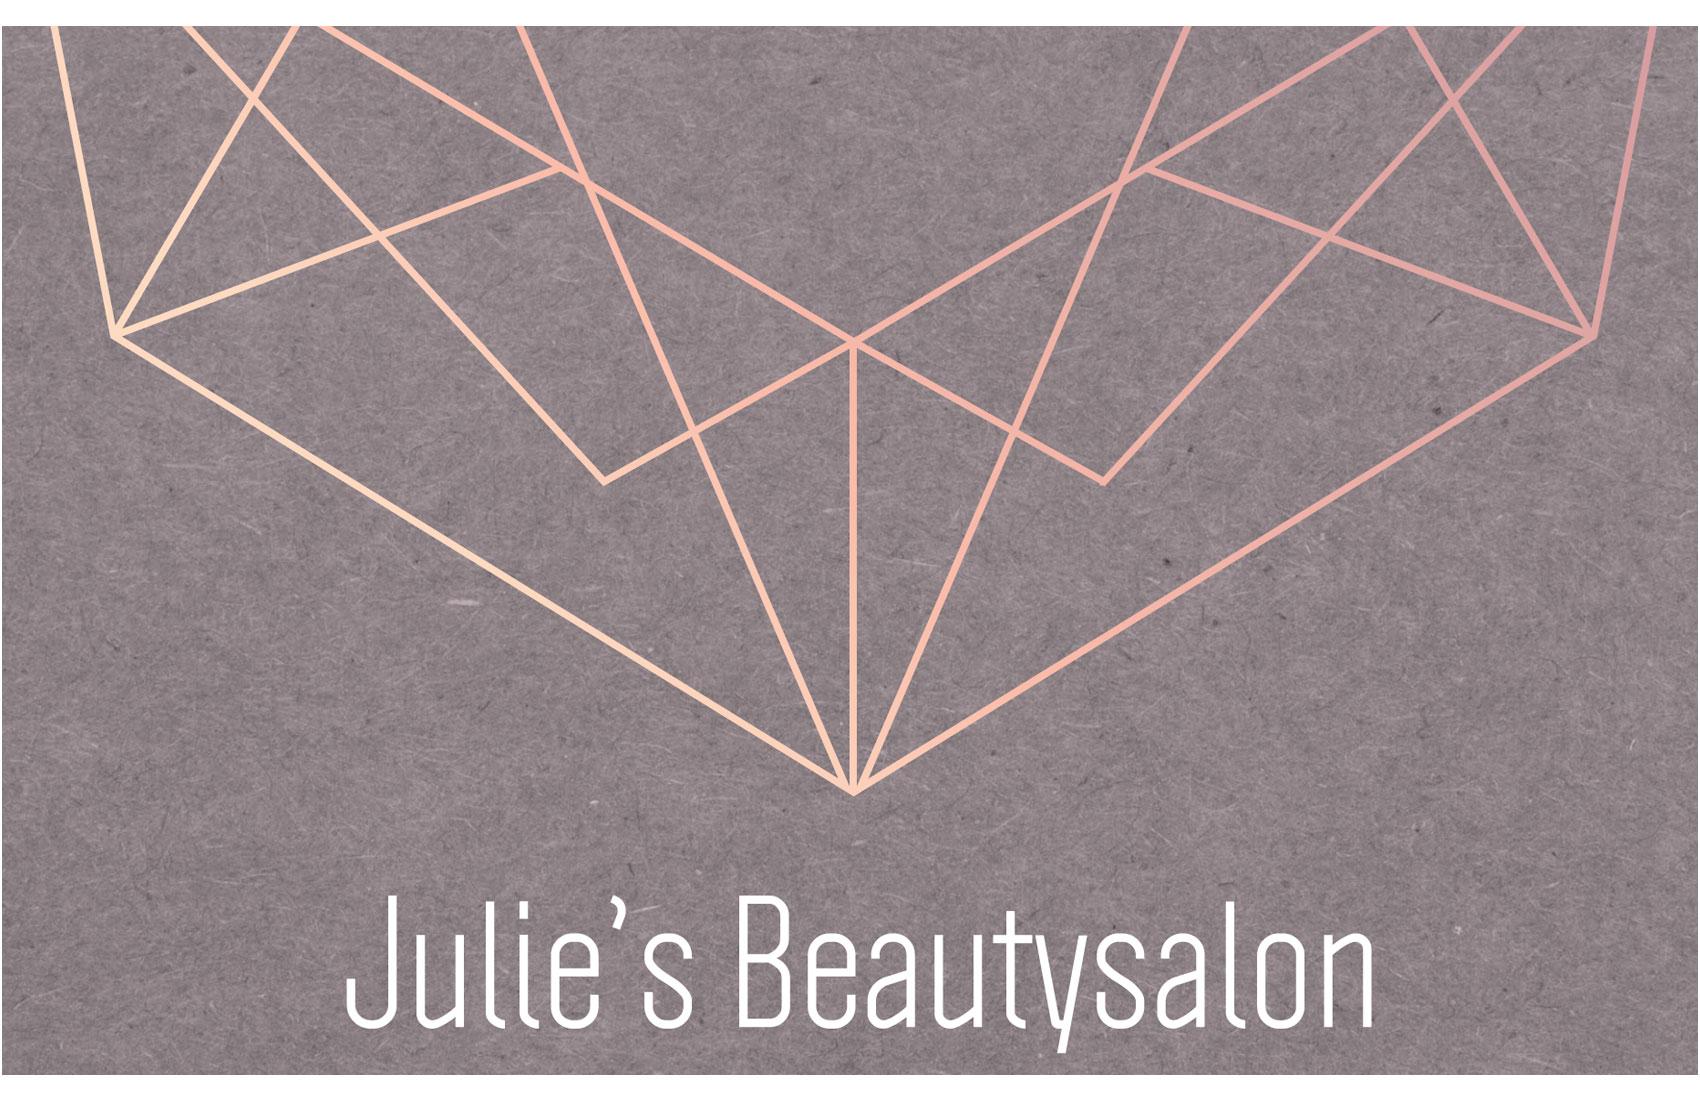 Julie's Beautysalon